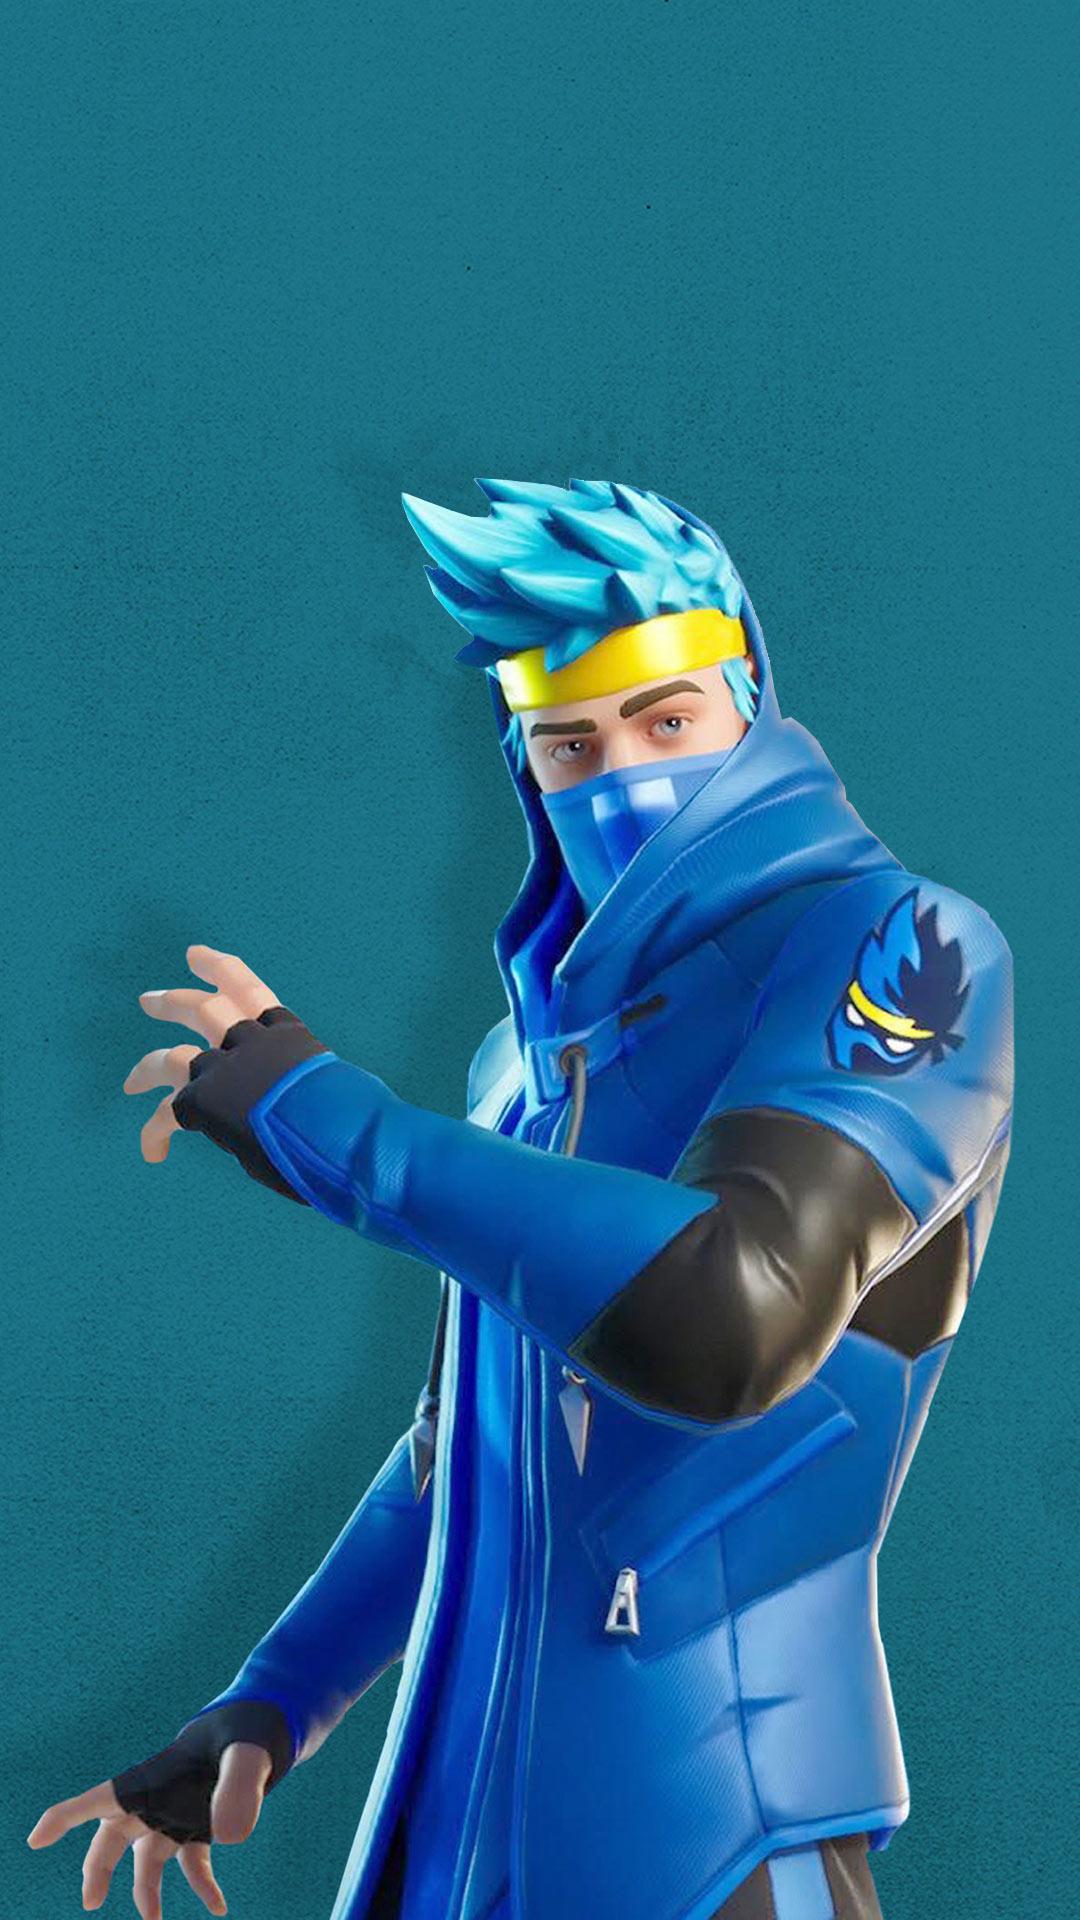 Ninja Skins Fortnite 2999268 Hd Wallpaper Backgrounds Download